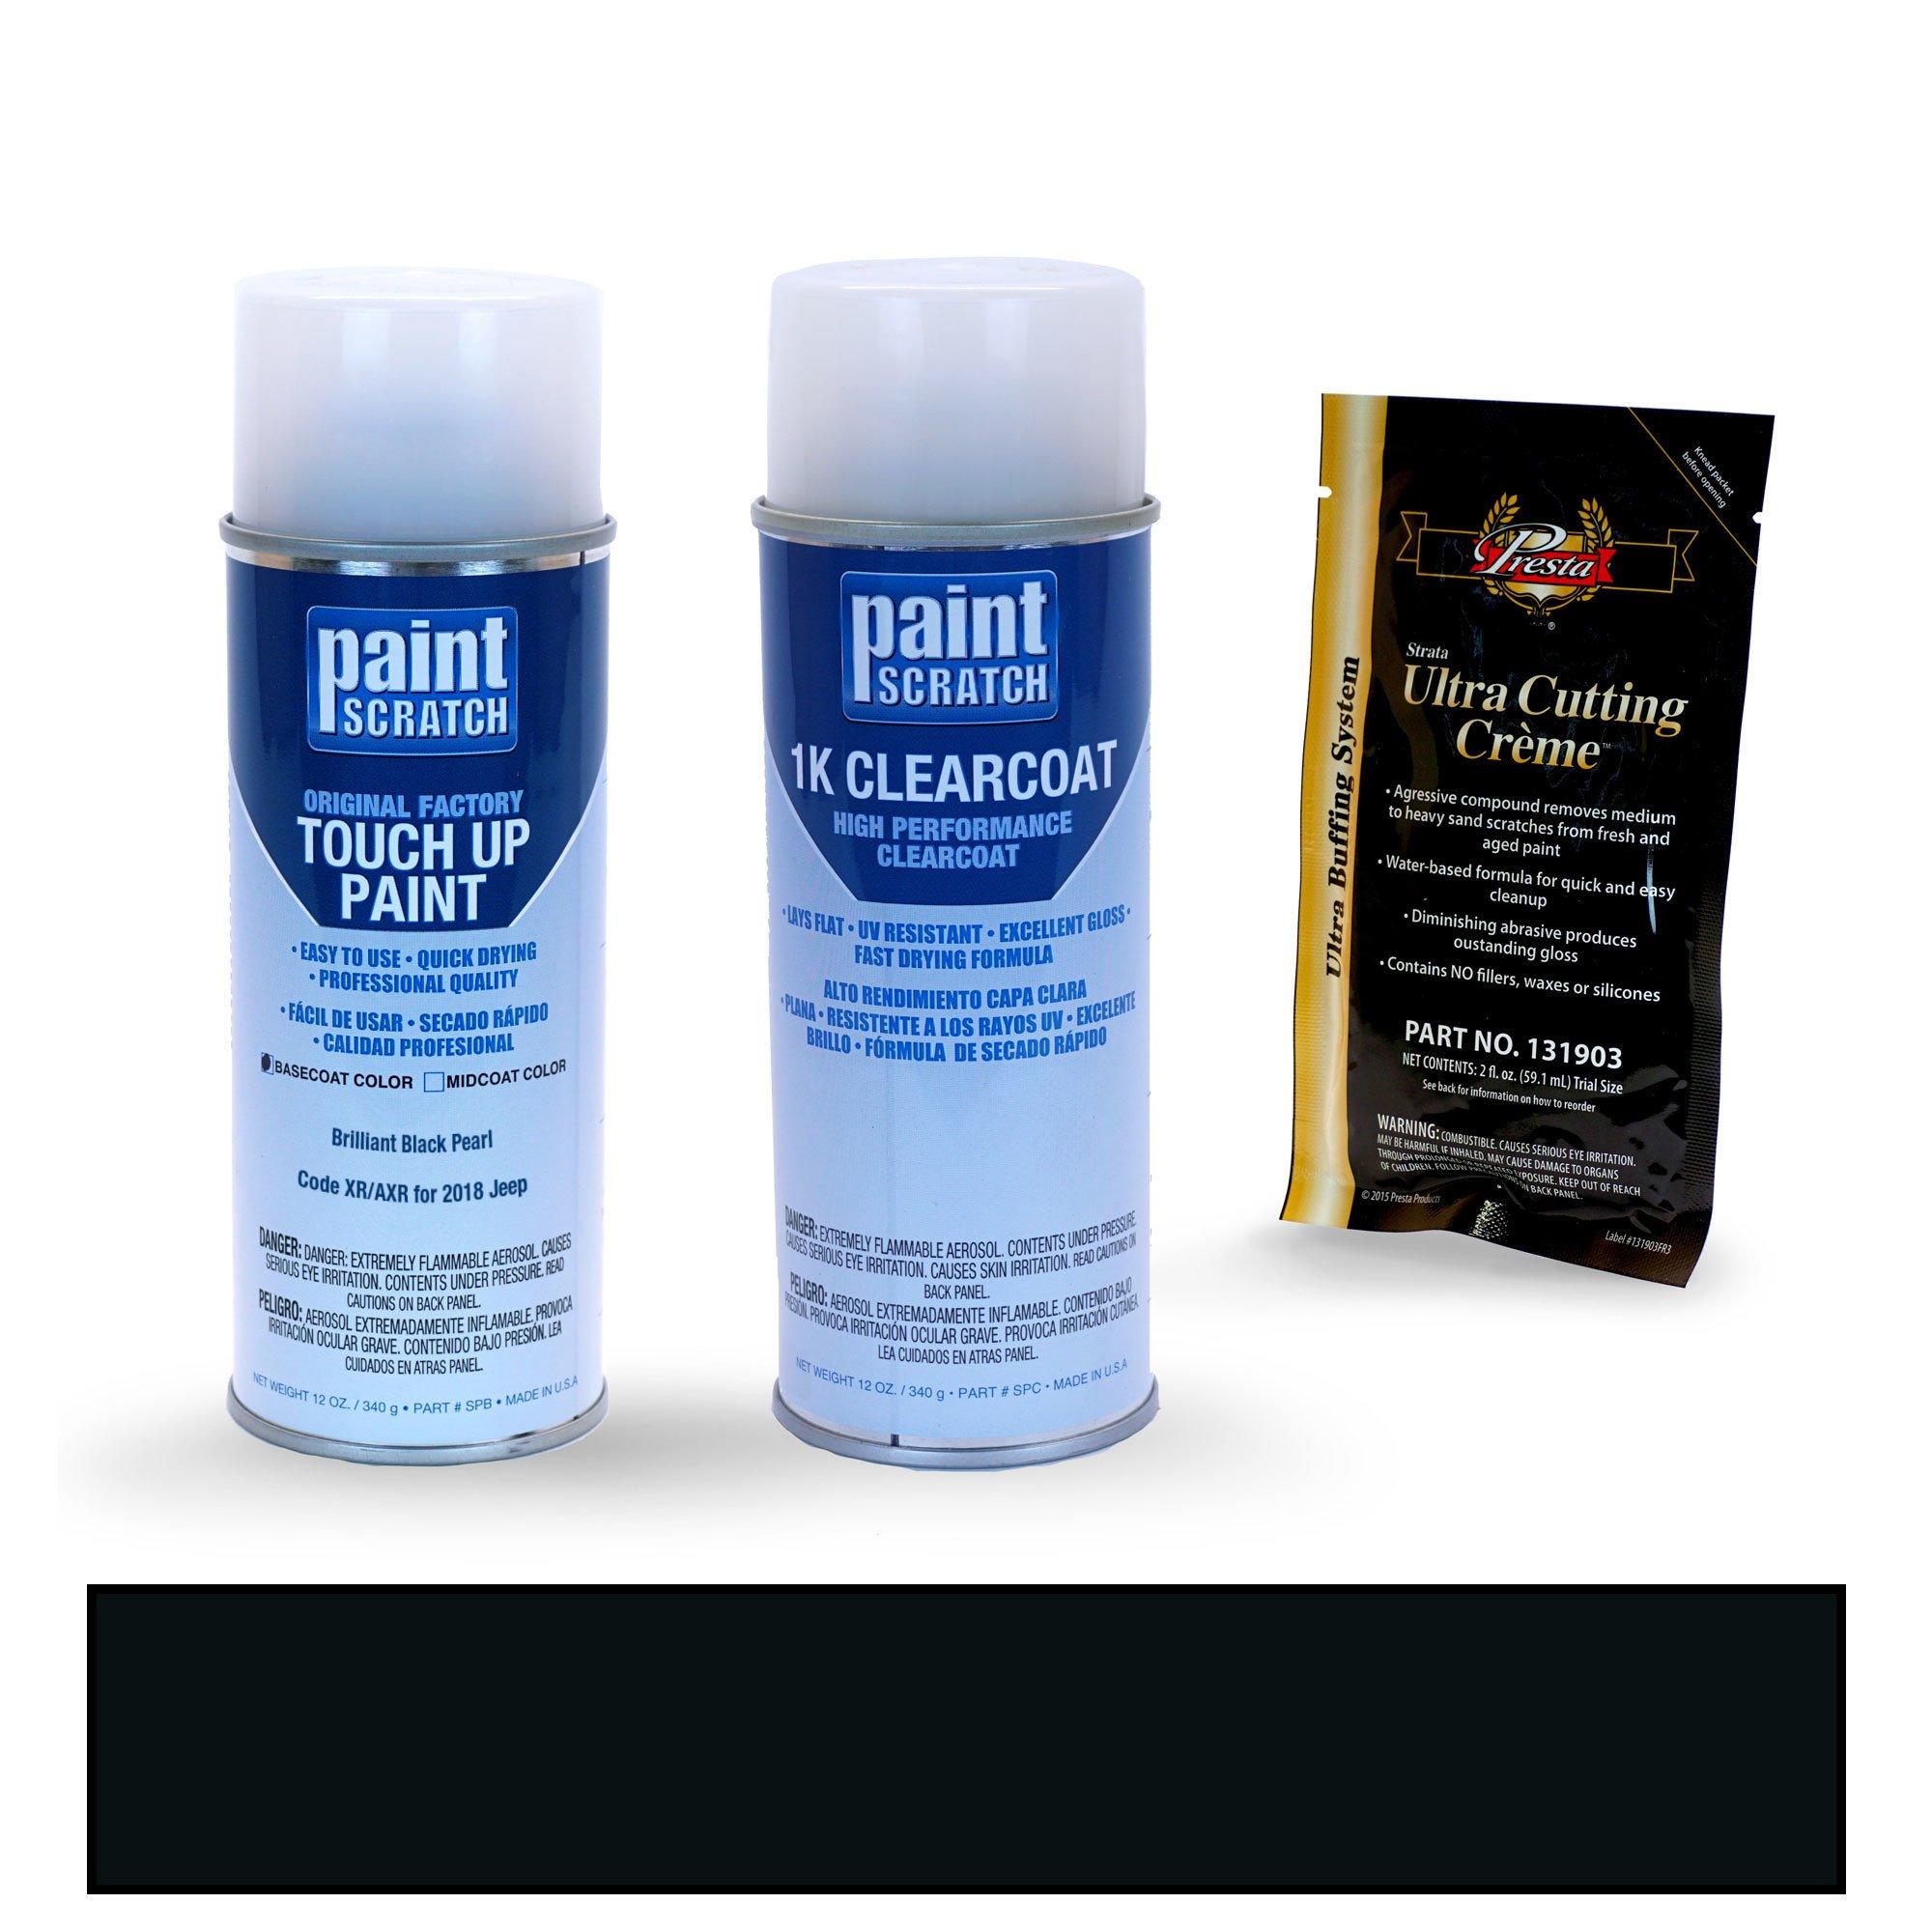 PAINTSCRATCH Brilliant Black Pearl XR/AXR for 2018 Jeep Wrangler - Touch Up Paint Spray Can Kit - Original Factory OEM Automotive Paint - Color Match Guaranteed